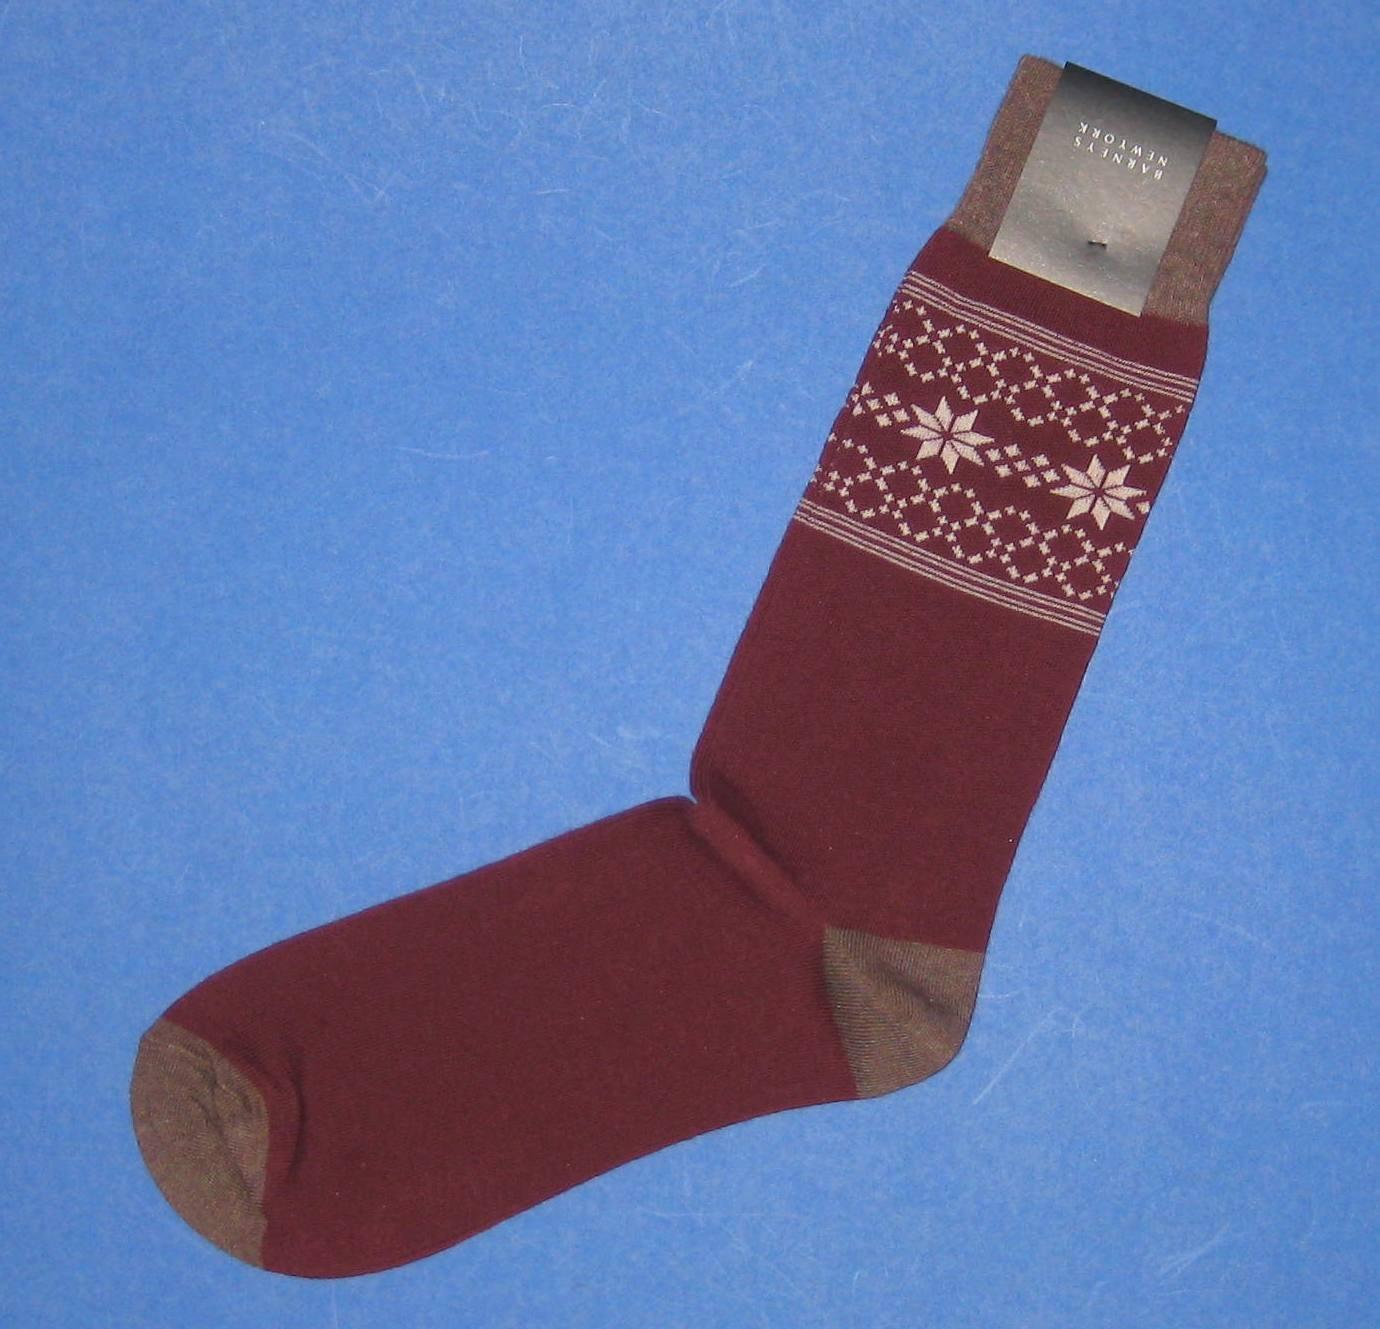 NWT Barneys New York Italian Made Burgundy Cotton Knit Snowflake Stars Dress Socks